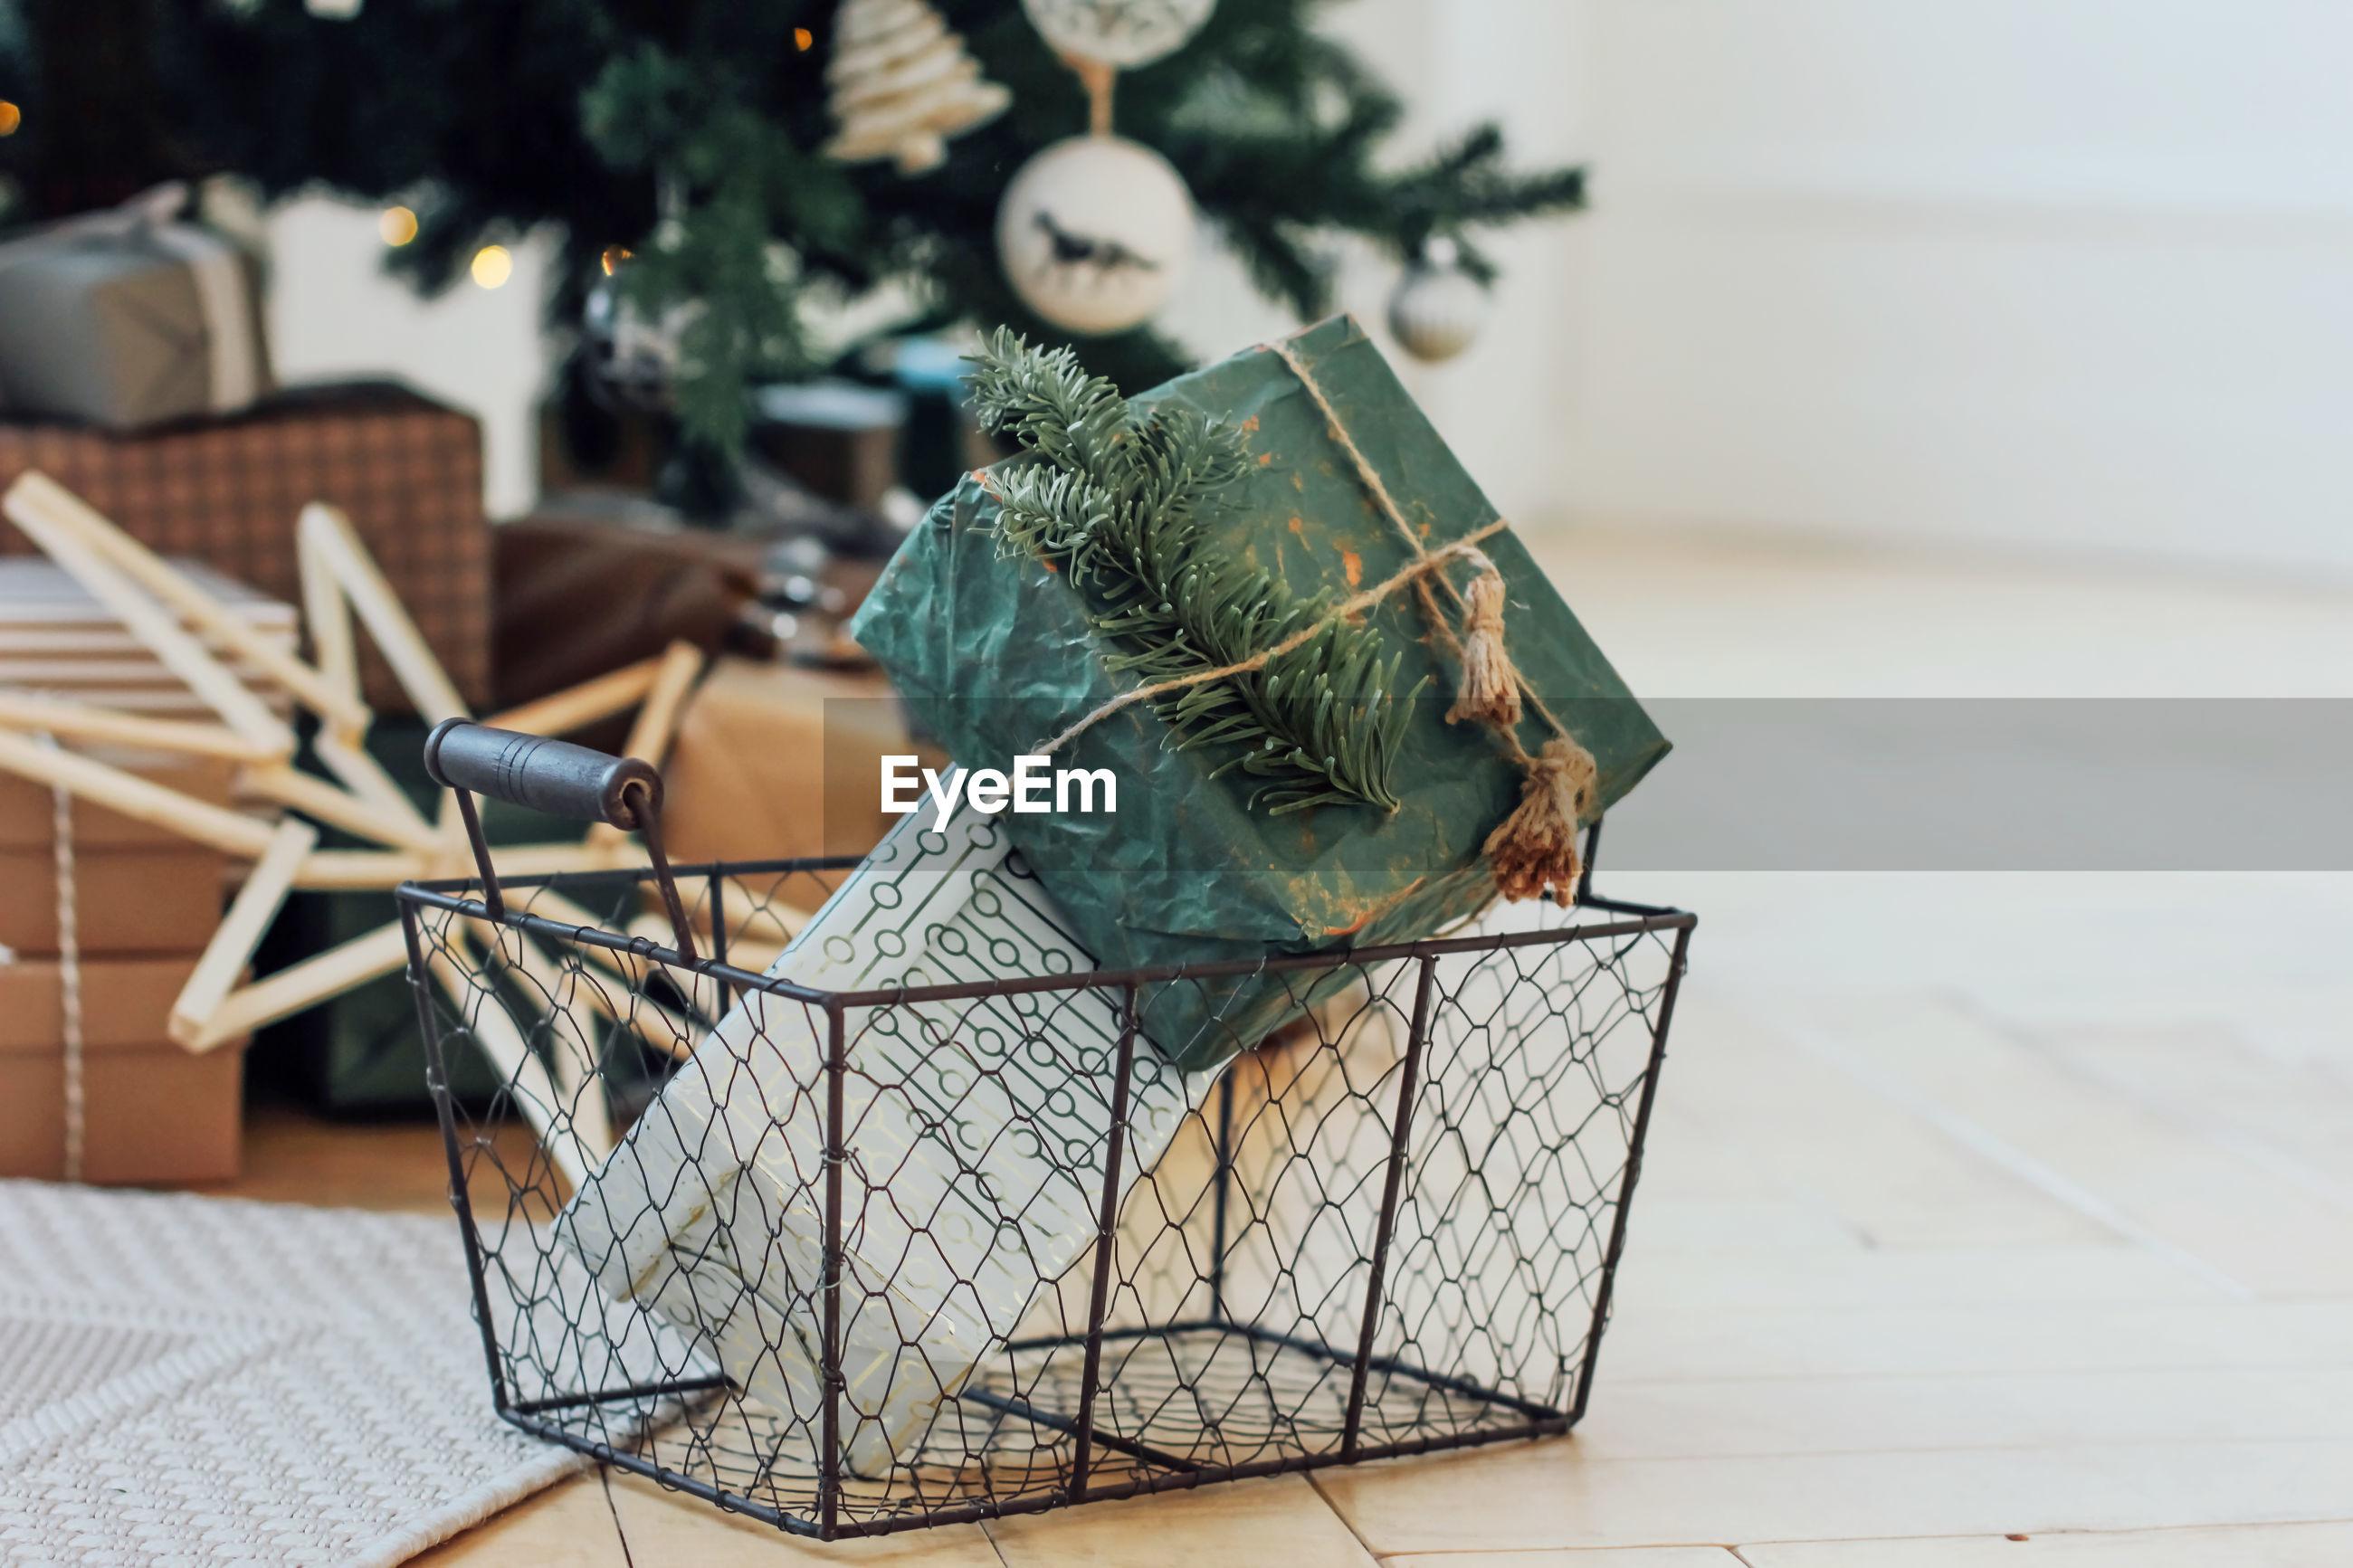 Close-up of gifts in metallic basket on hardwood floor